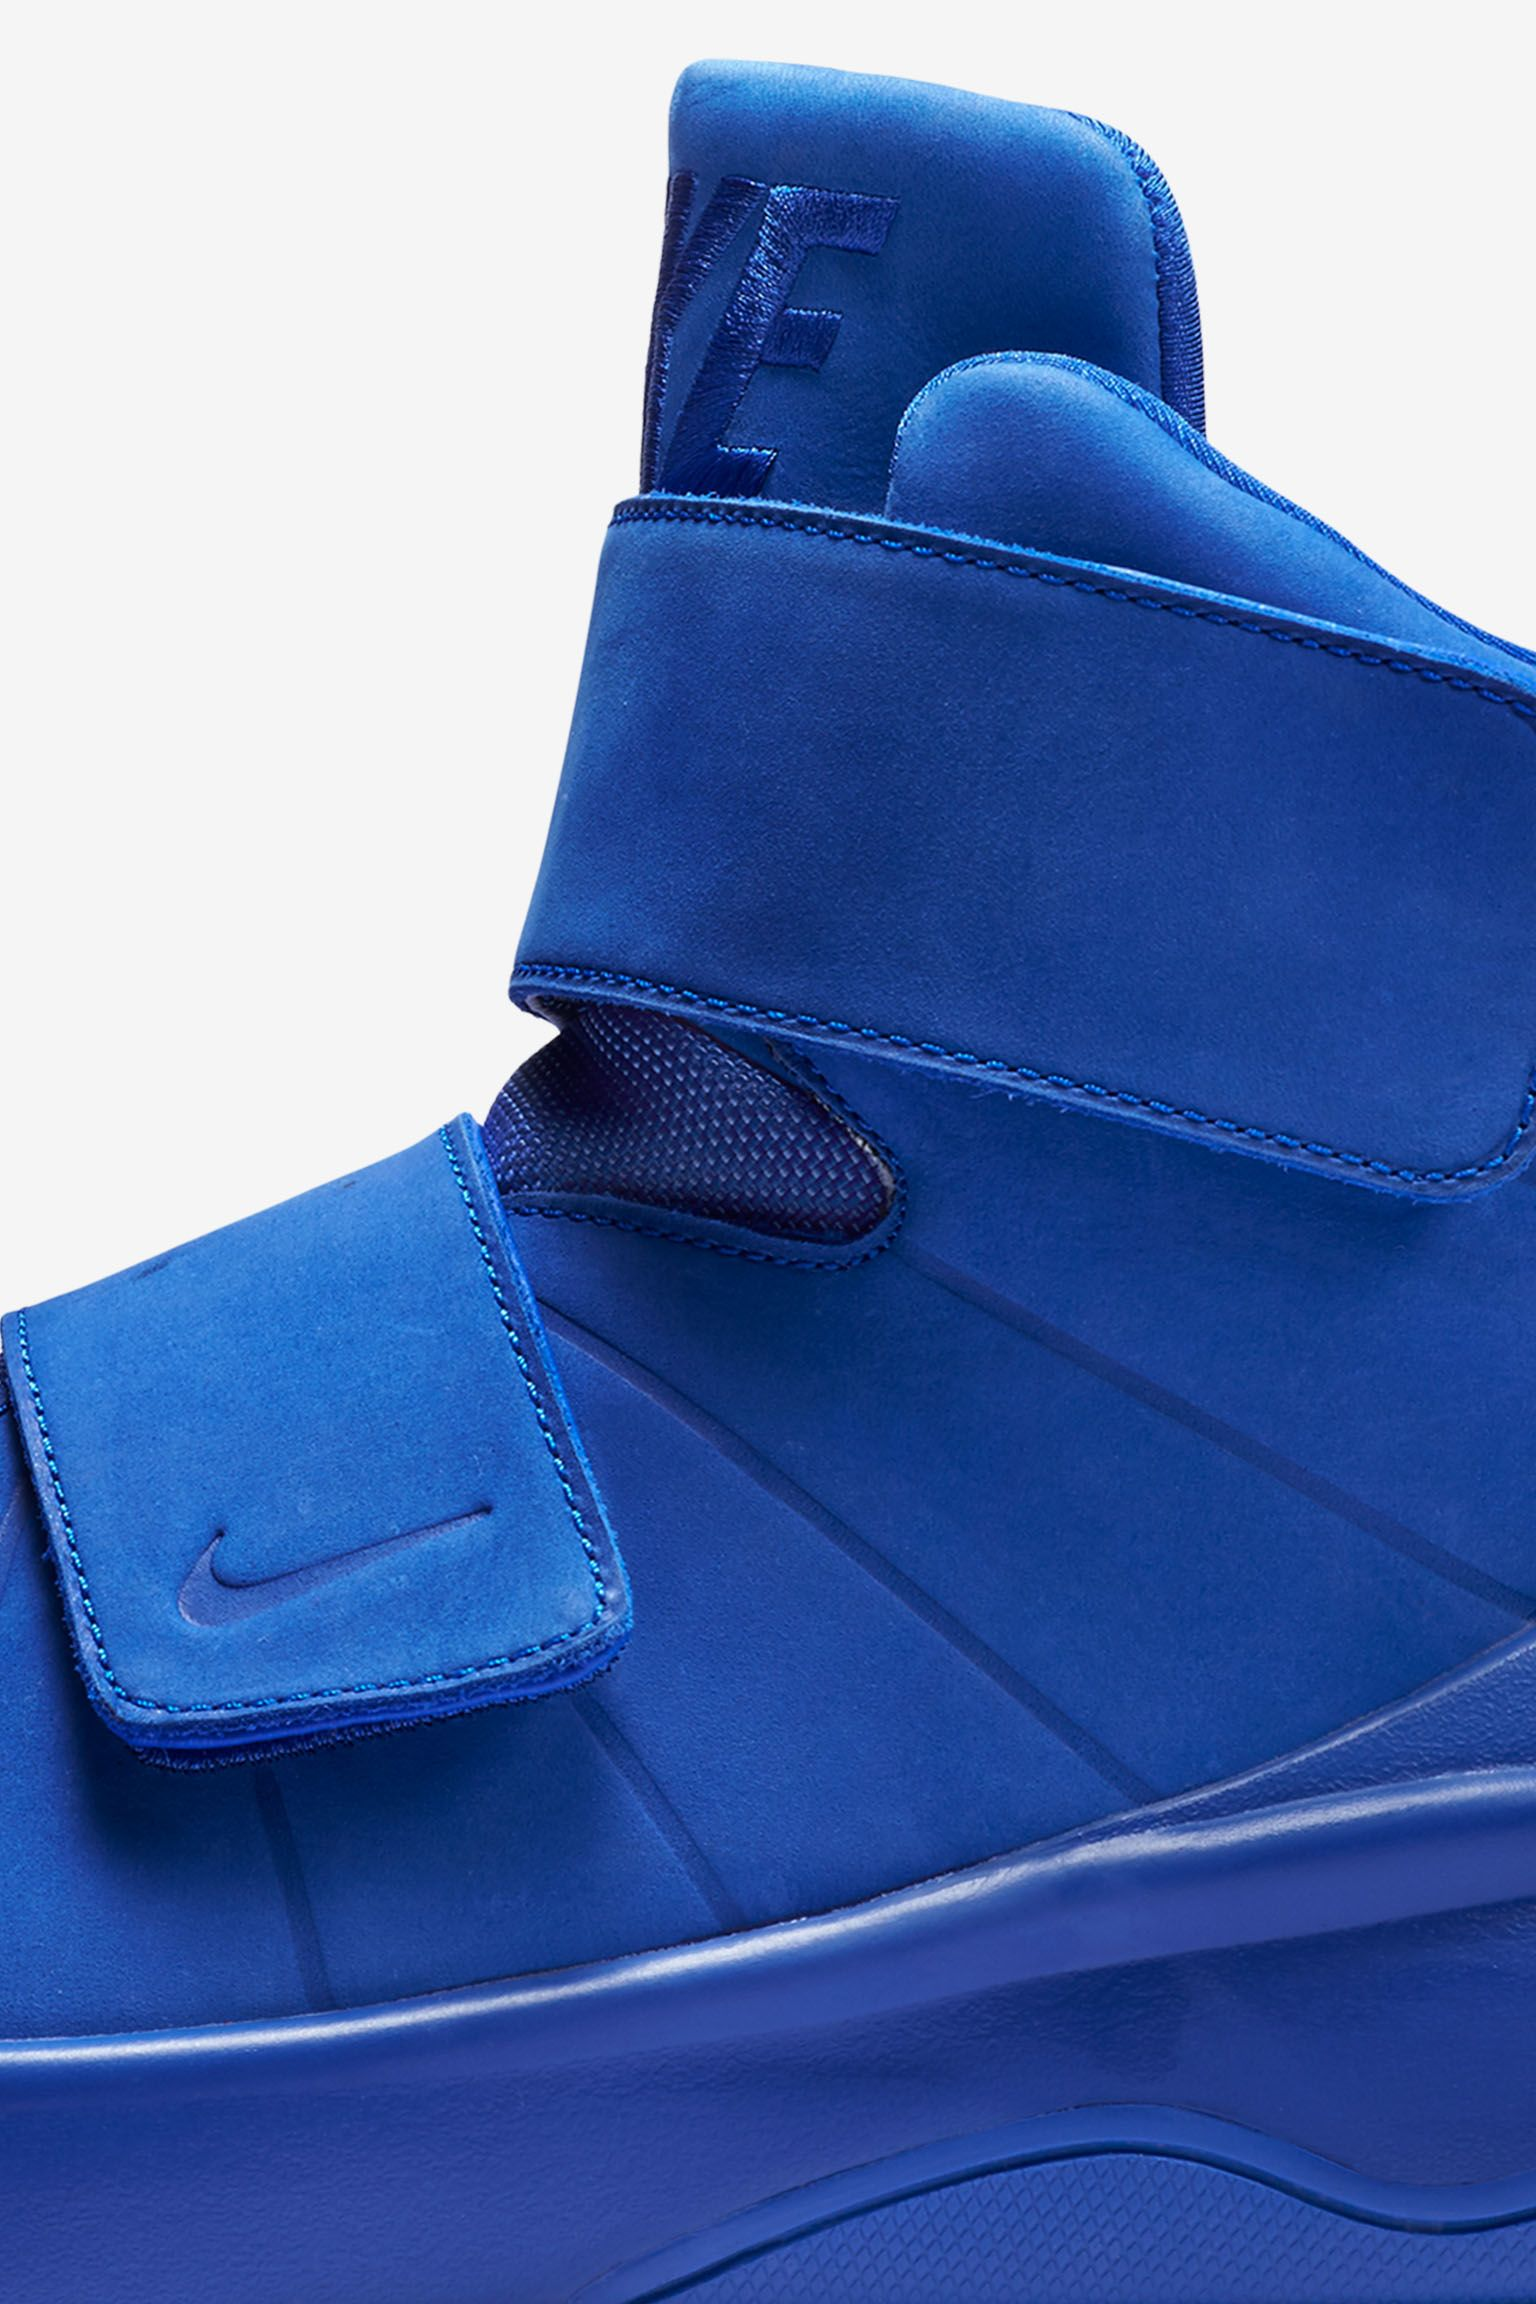 Nike Marxman 'Racer Blue'